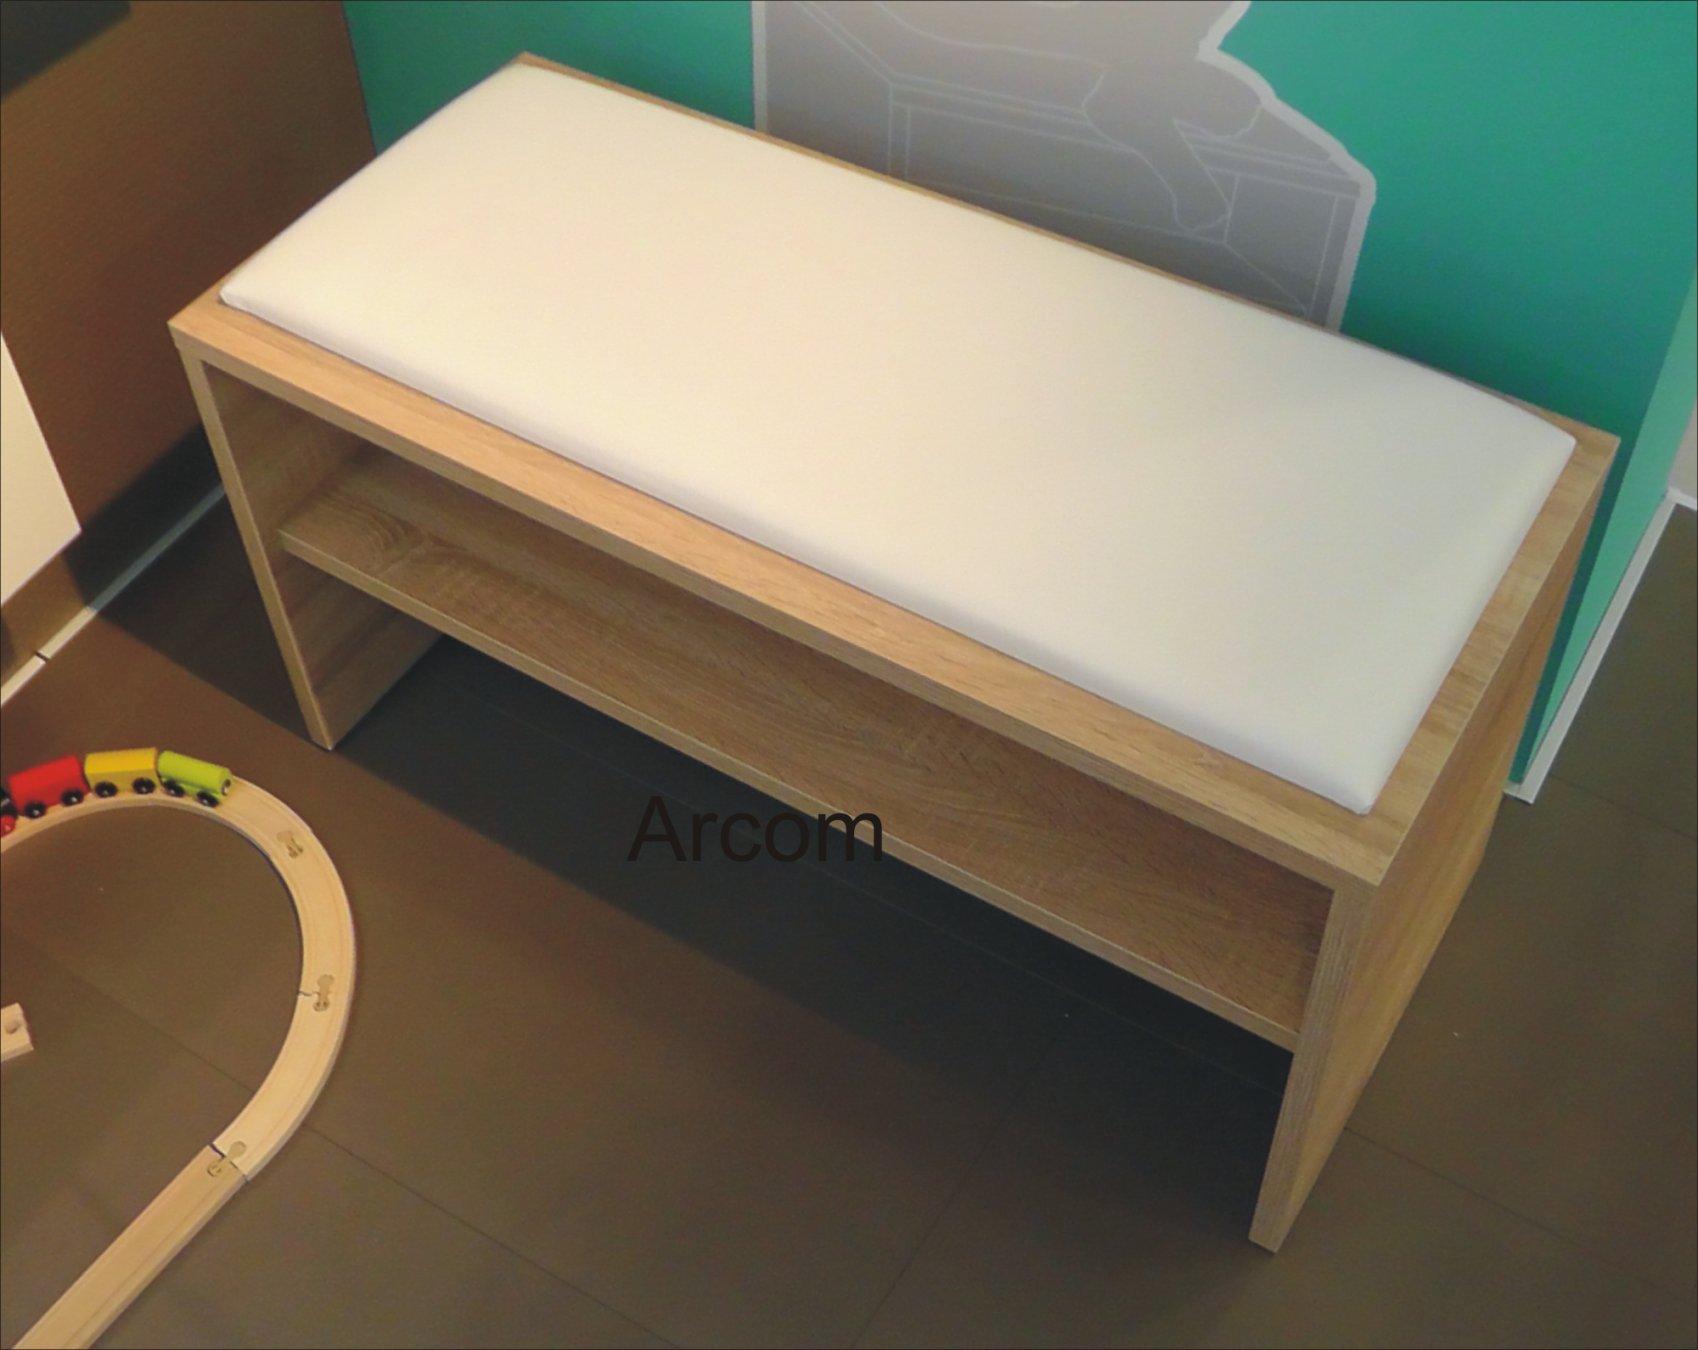 pelipal solitaire 7020 hochschrank 30 cm. Black Bedroom Furniture Sets. Home Design Ideas